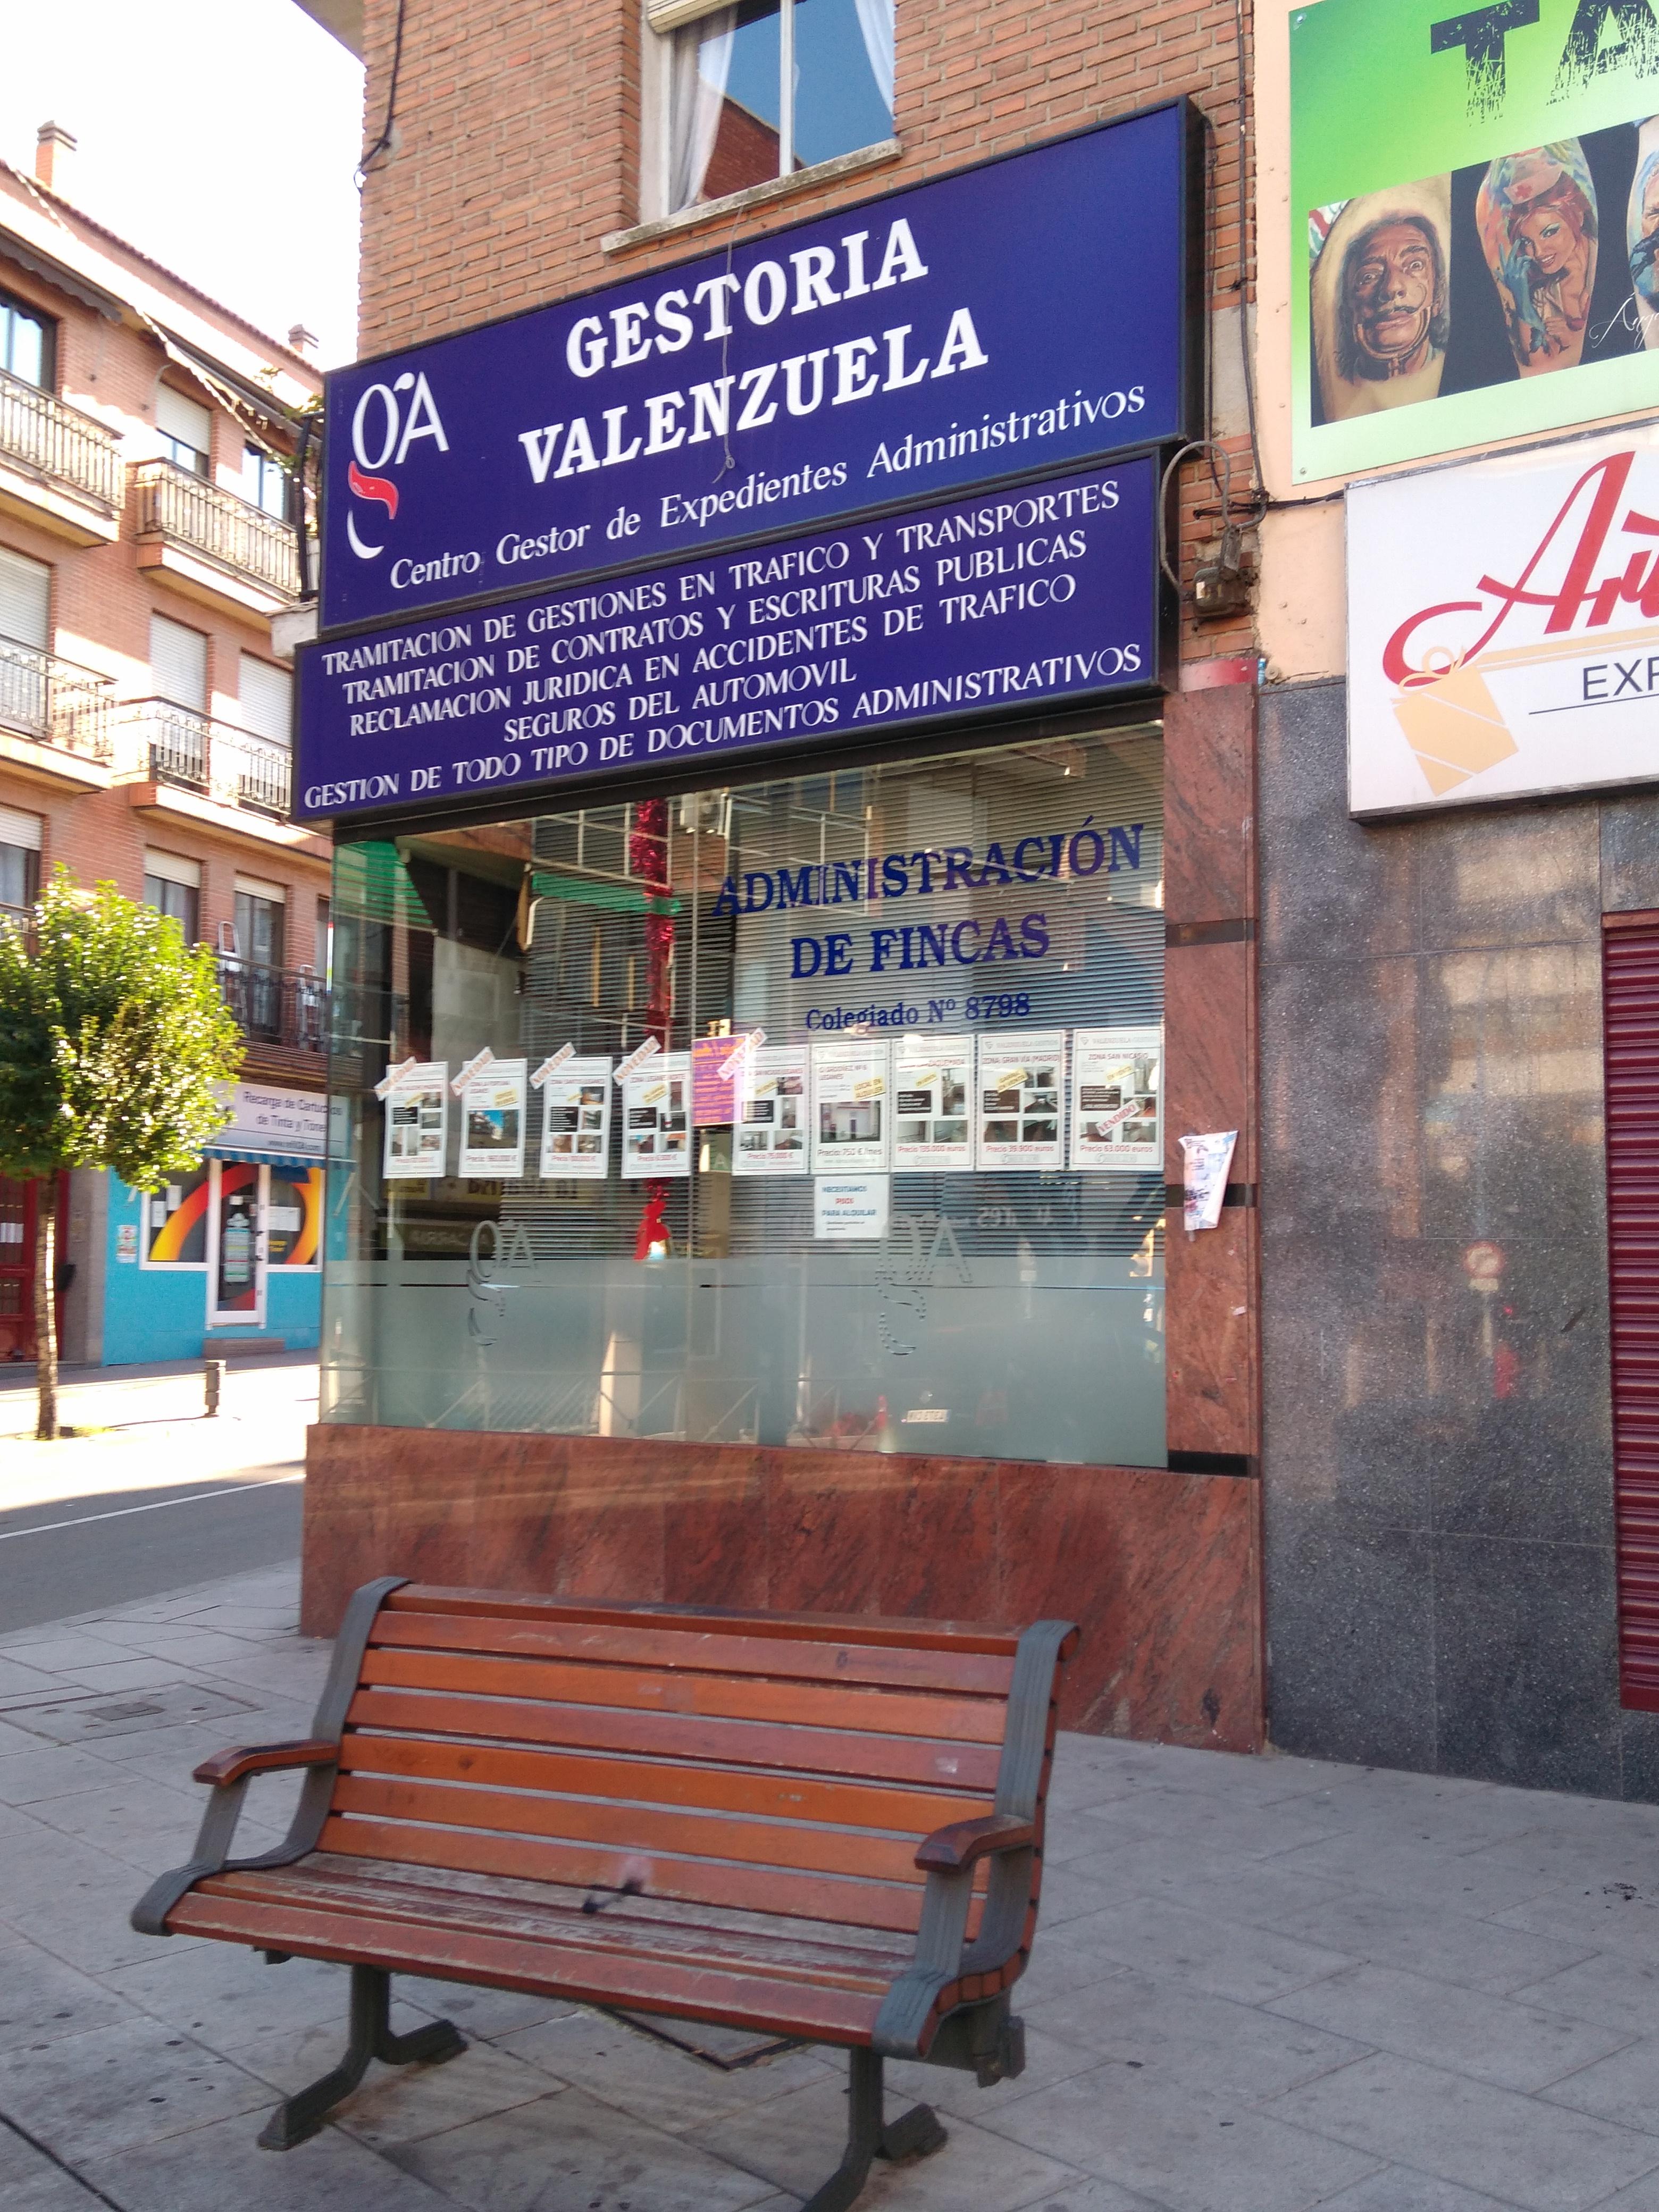 Gestor a valenzuela legan s av fuenlabrada 40 local - Herrero online particulares ...